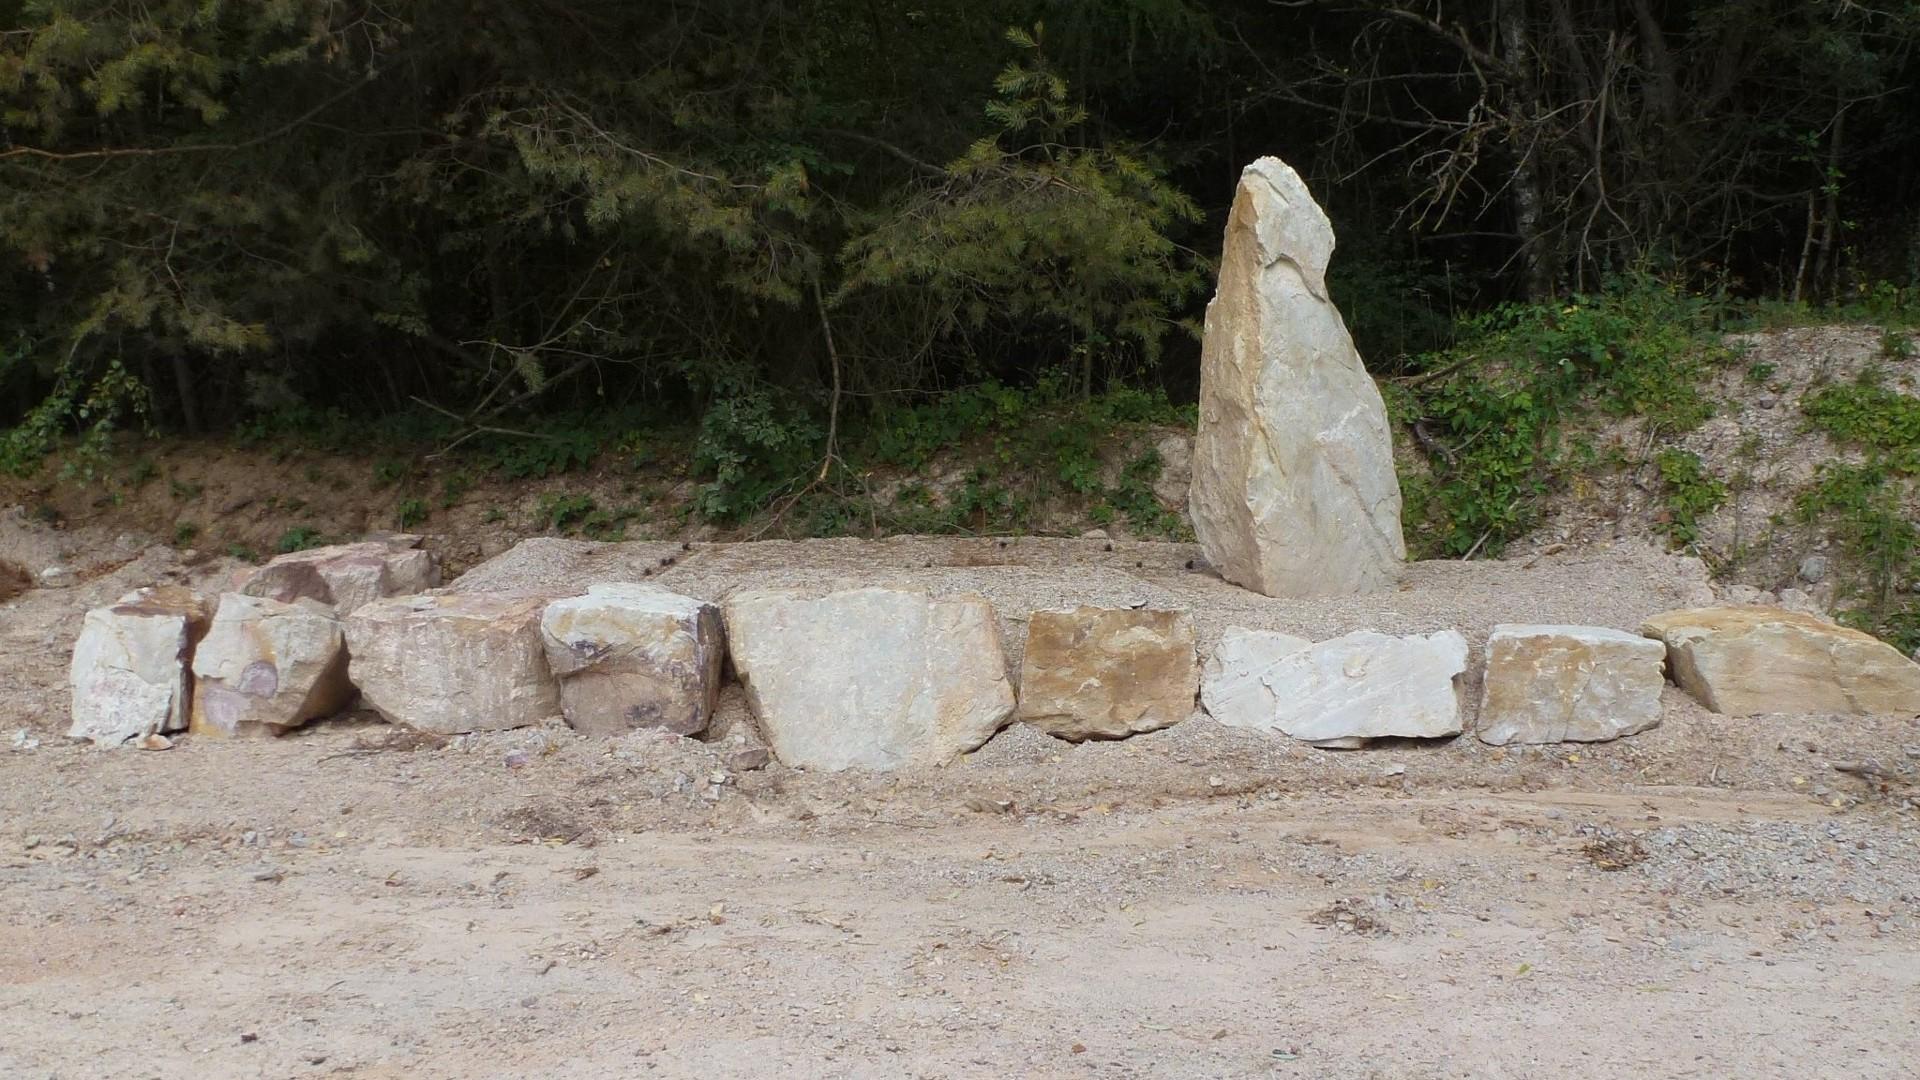 Sandkopf-031.jpg